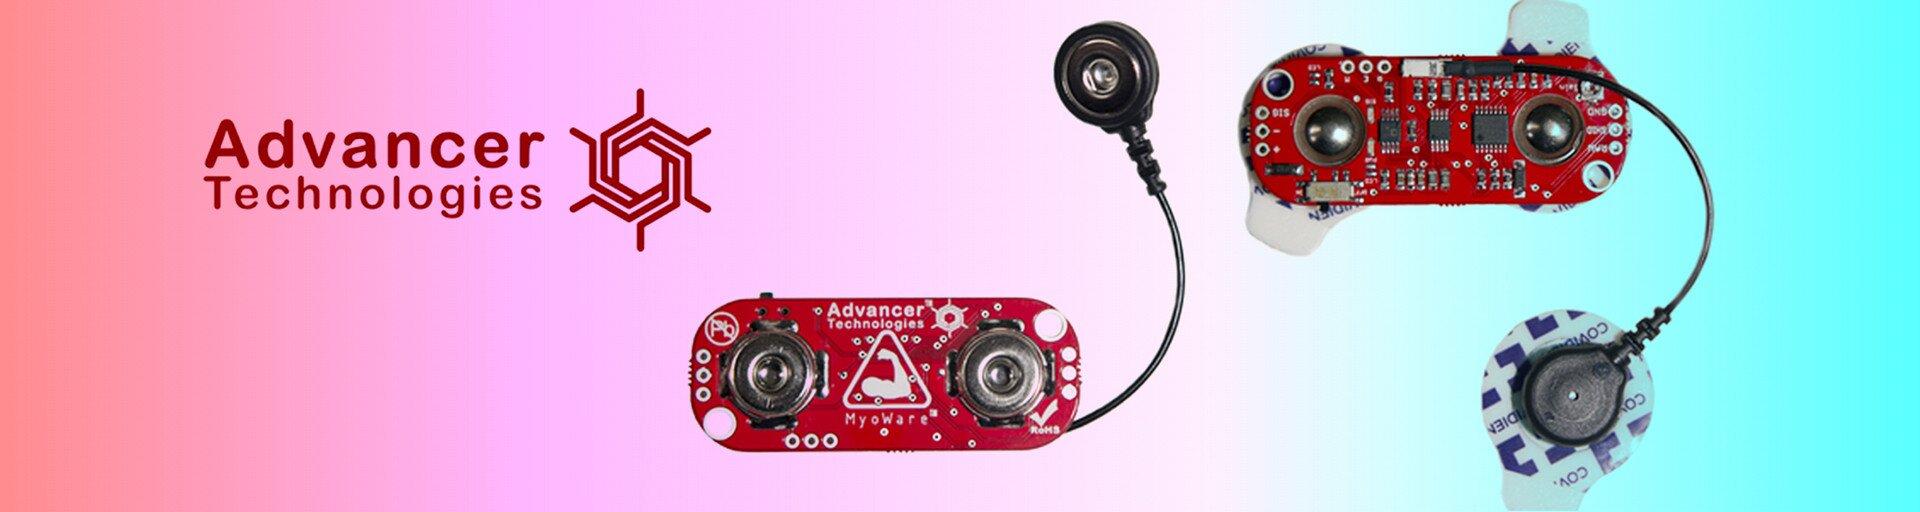 Advancer Technologies